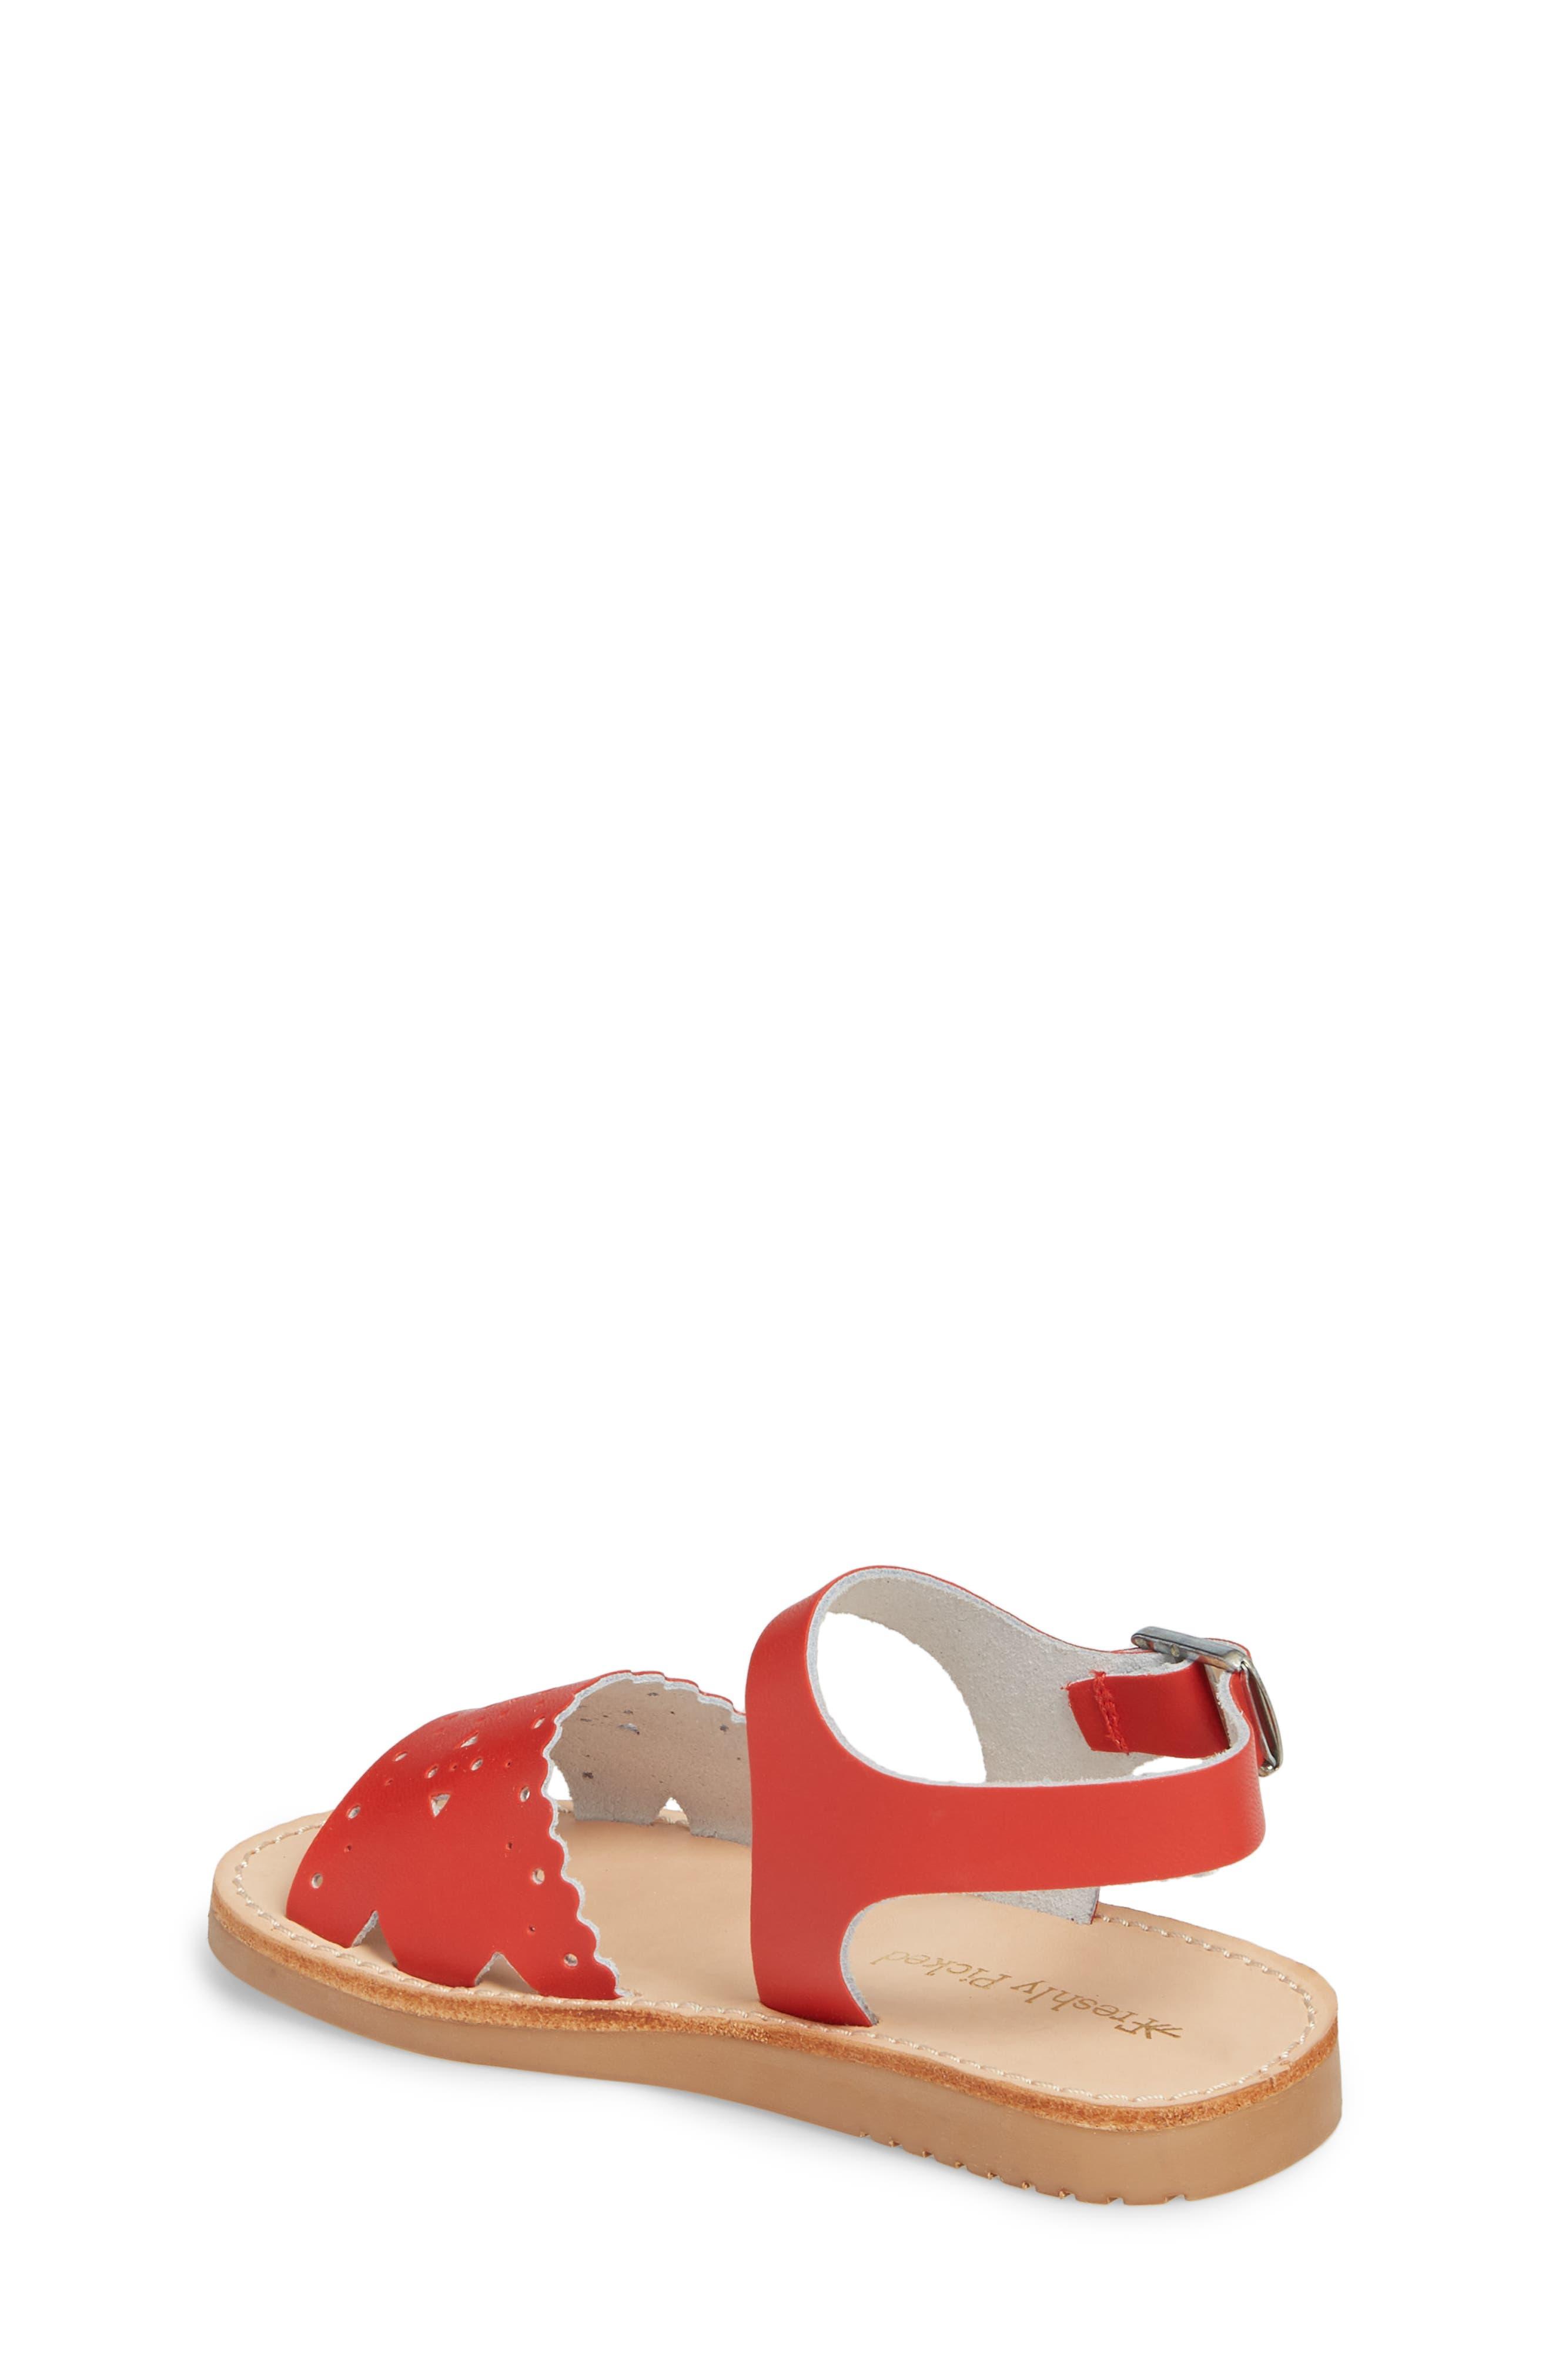 Laguna Water Resistant Perforated Sandal,                             Alternate thumbnail 2, color,                             CHERRY